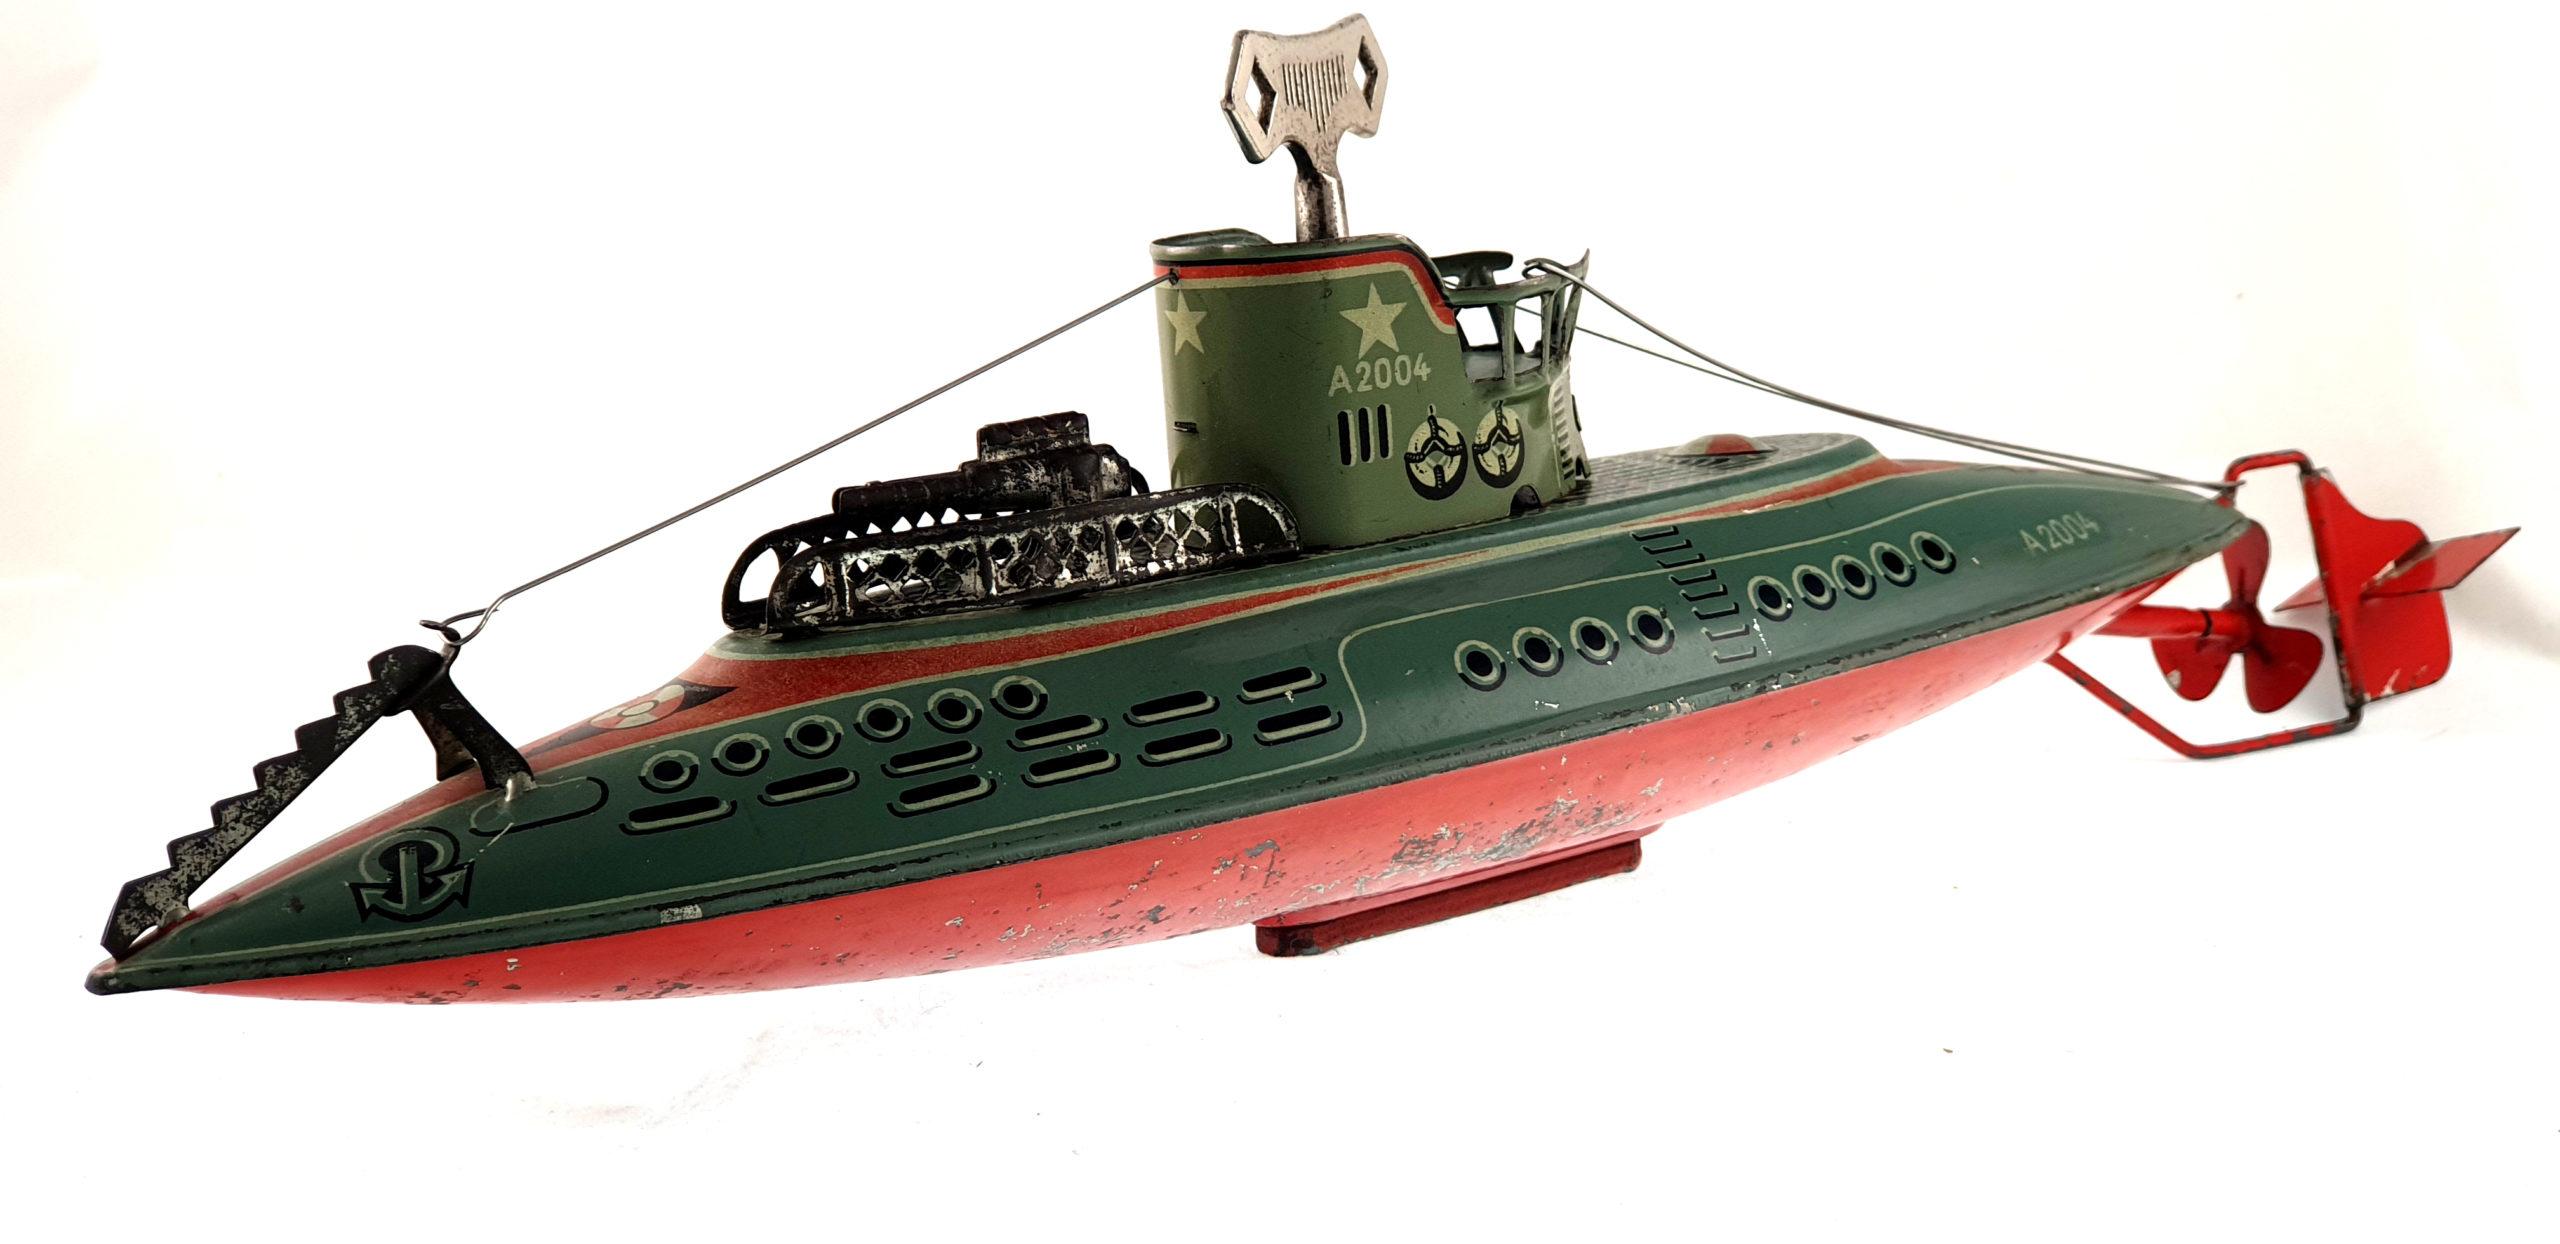 Sottomarino A 2004